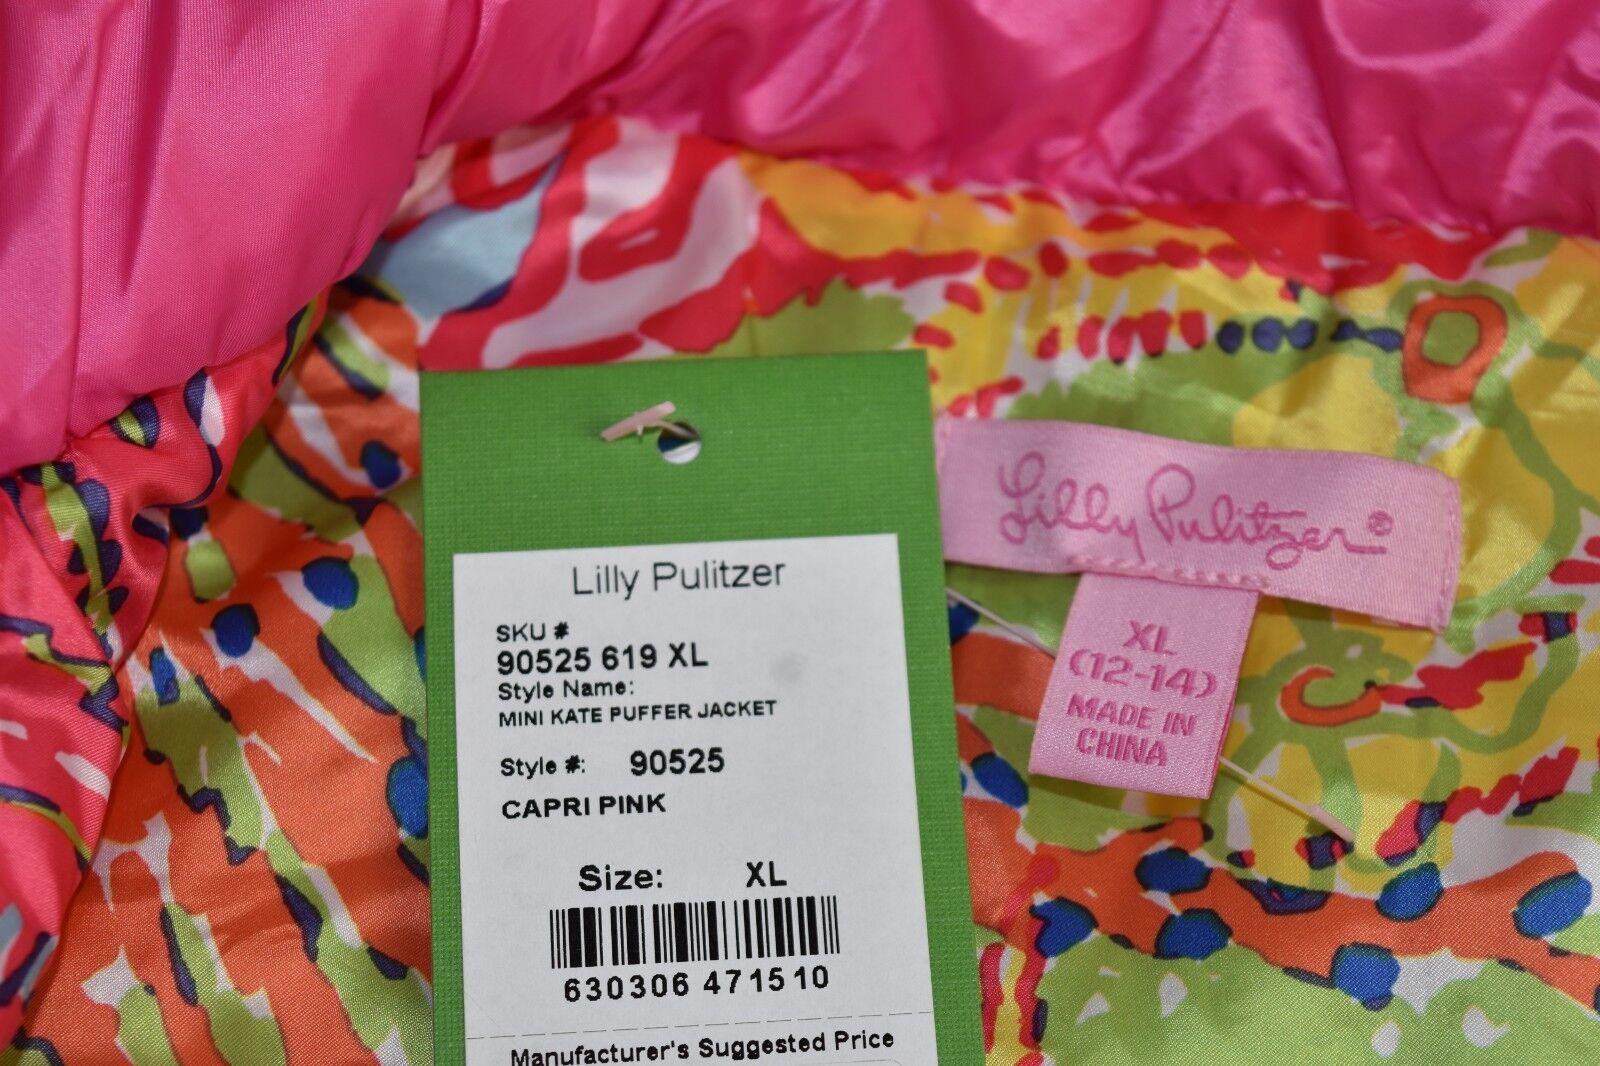 Lilly Pulitzer Girls Resort White Paradisio Mini Kate Puffer Jacket